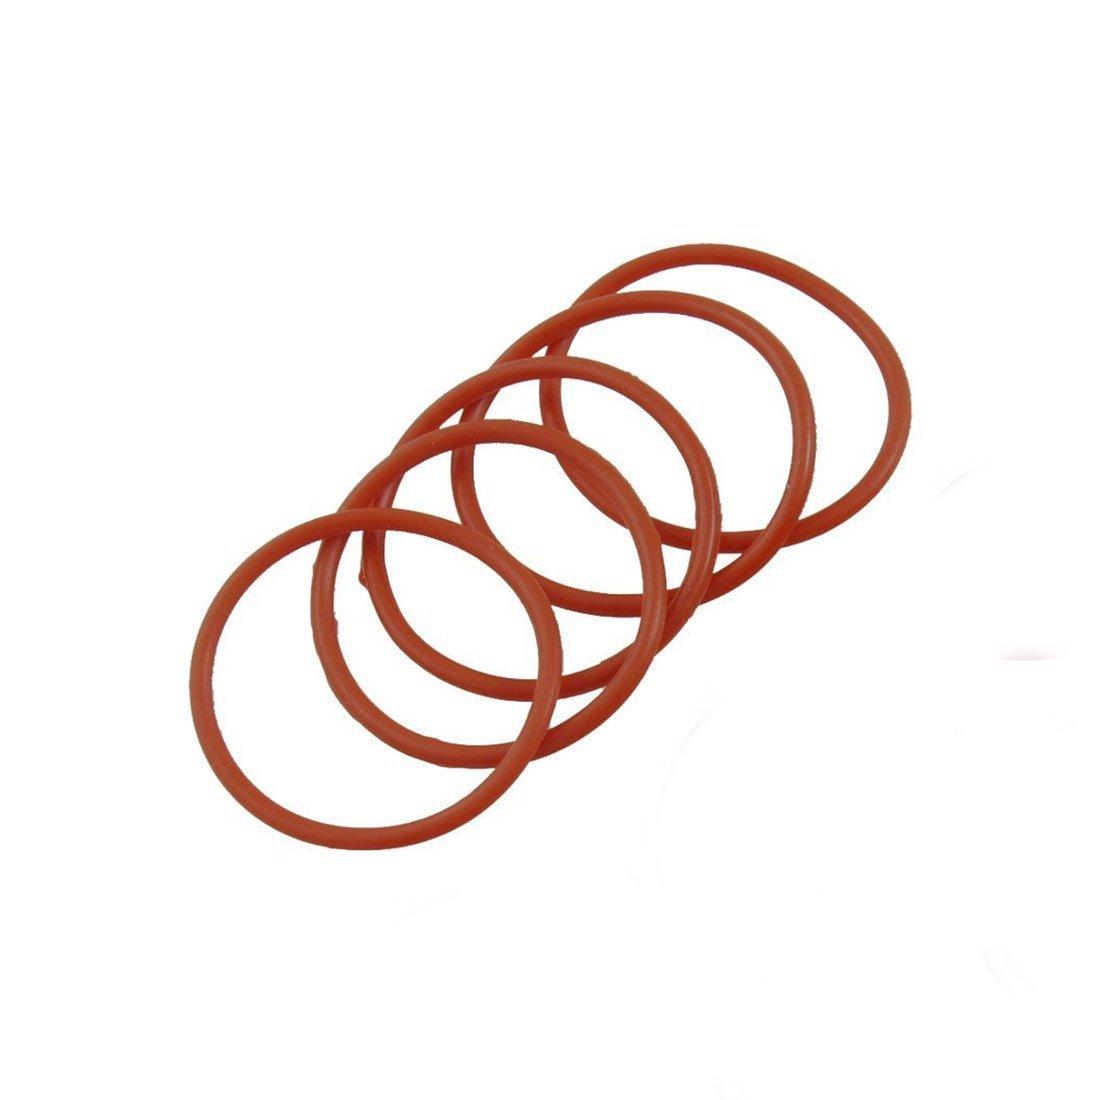 0,6 cm de ancho 5 juntas t/óricas de silicona para juntas t/óricas de 10,0 cm de di/ámetro exterior de 3,5 cm de di/ámetro interior Flyshop